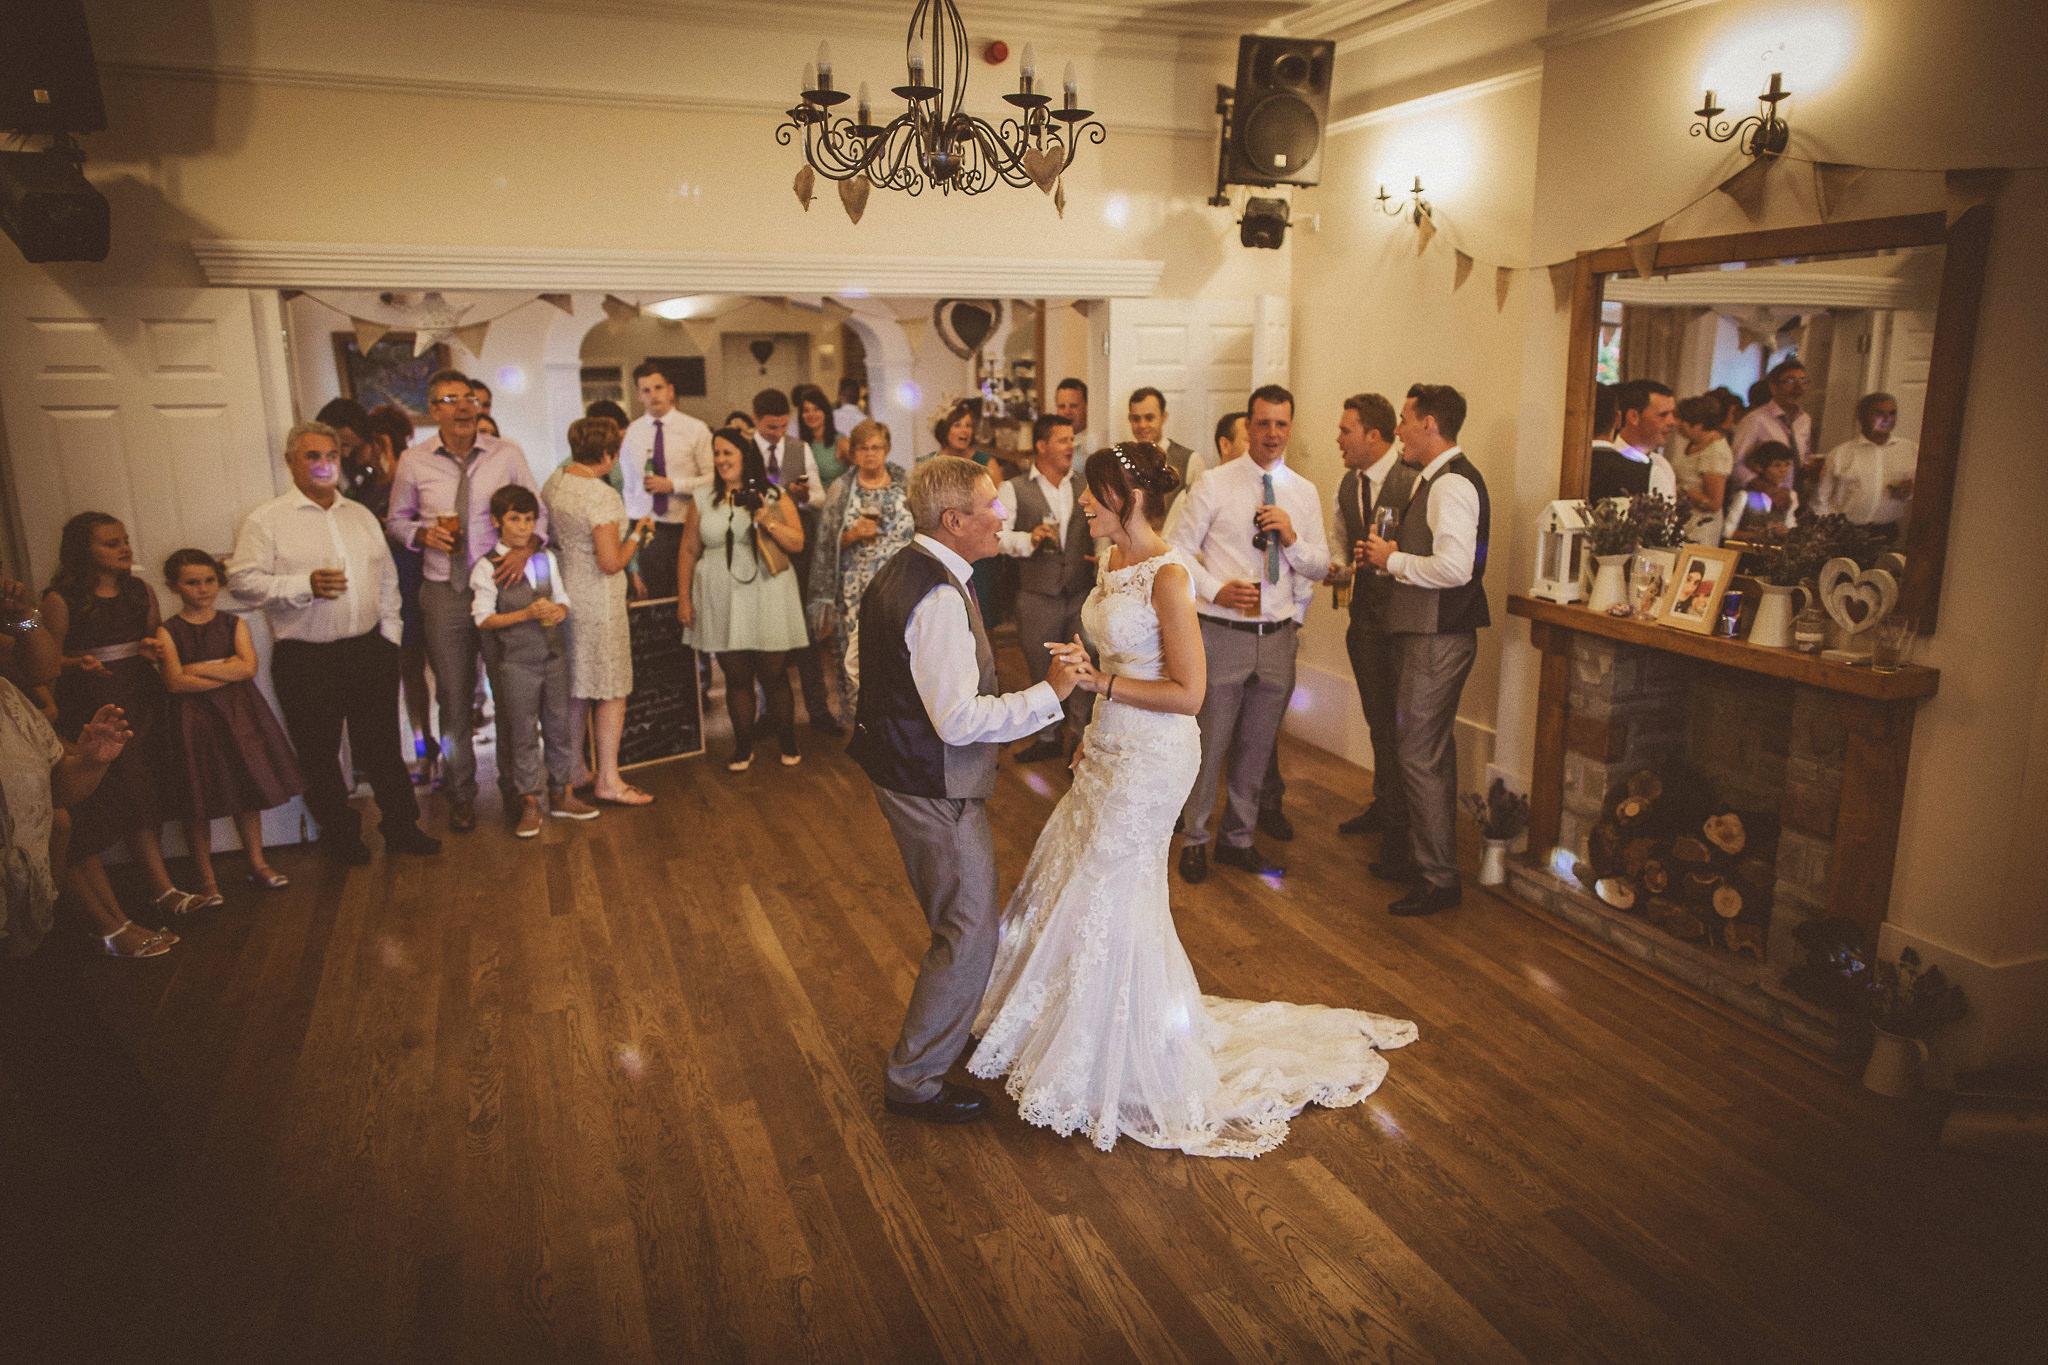 paul-marbrook-Caer-Llan-Wedding-Photographer-90094